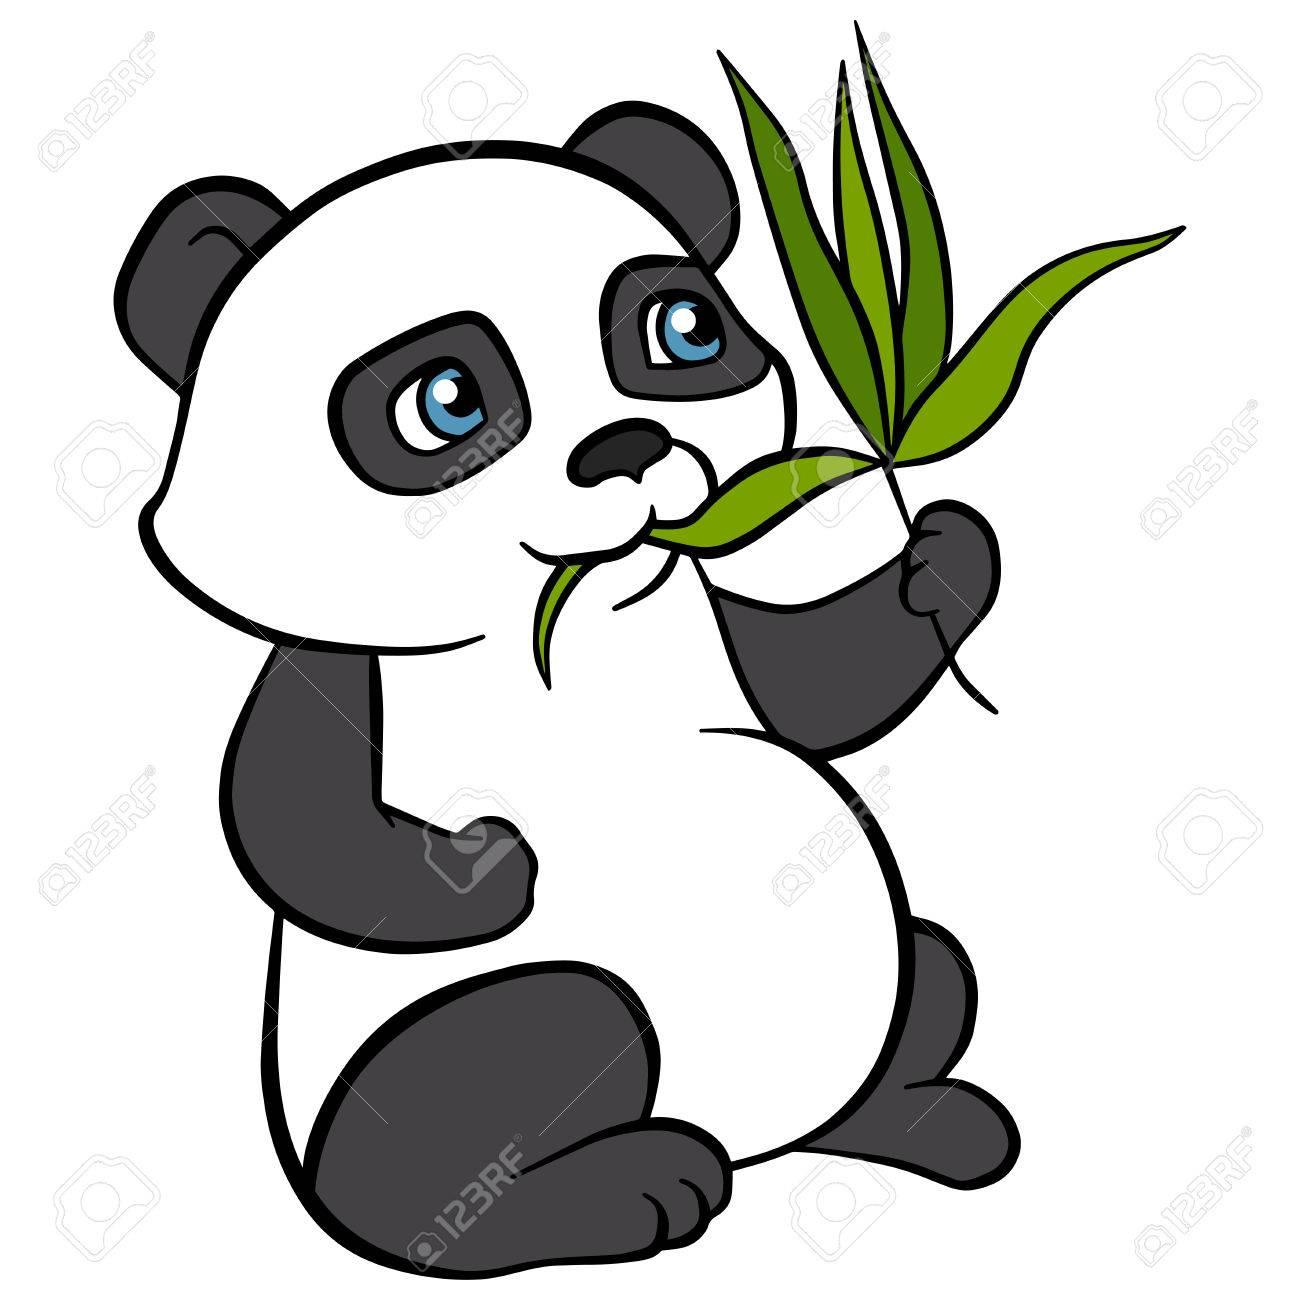 Wils De Dibujos Animados Animales Para Los Ninos Pequeno Panda